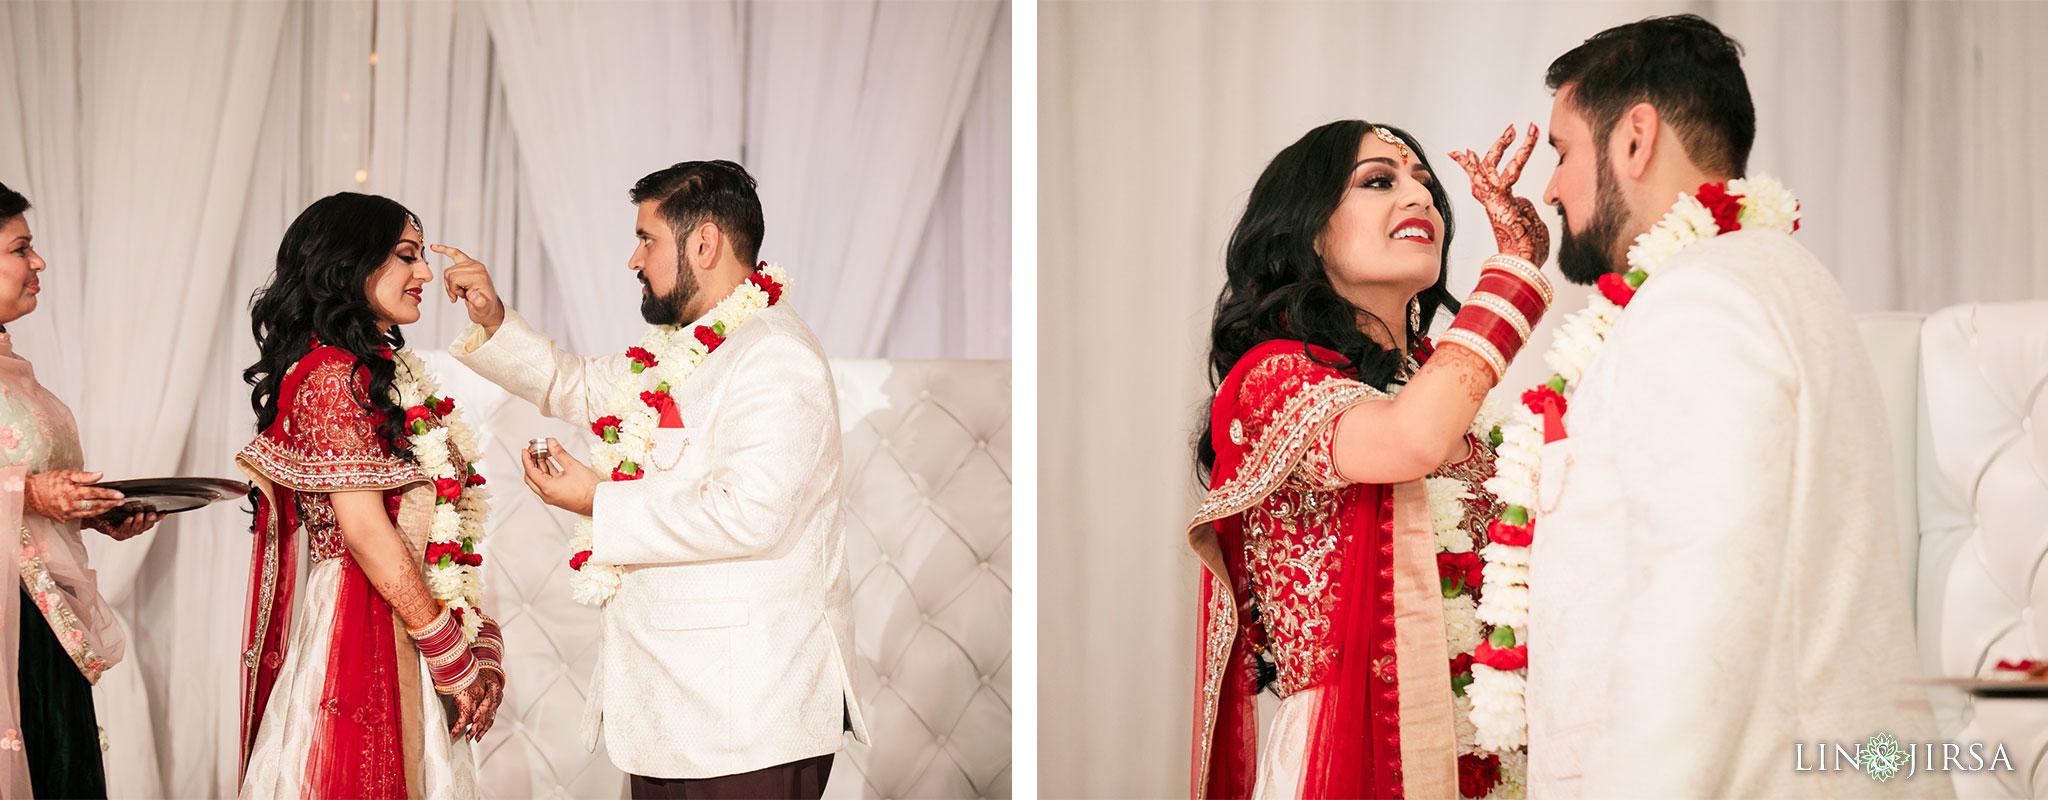 33 Diamond Bar Center Inland Empire Indian Wedding Photography